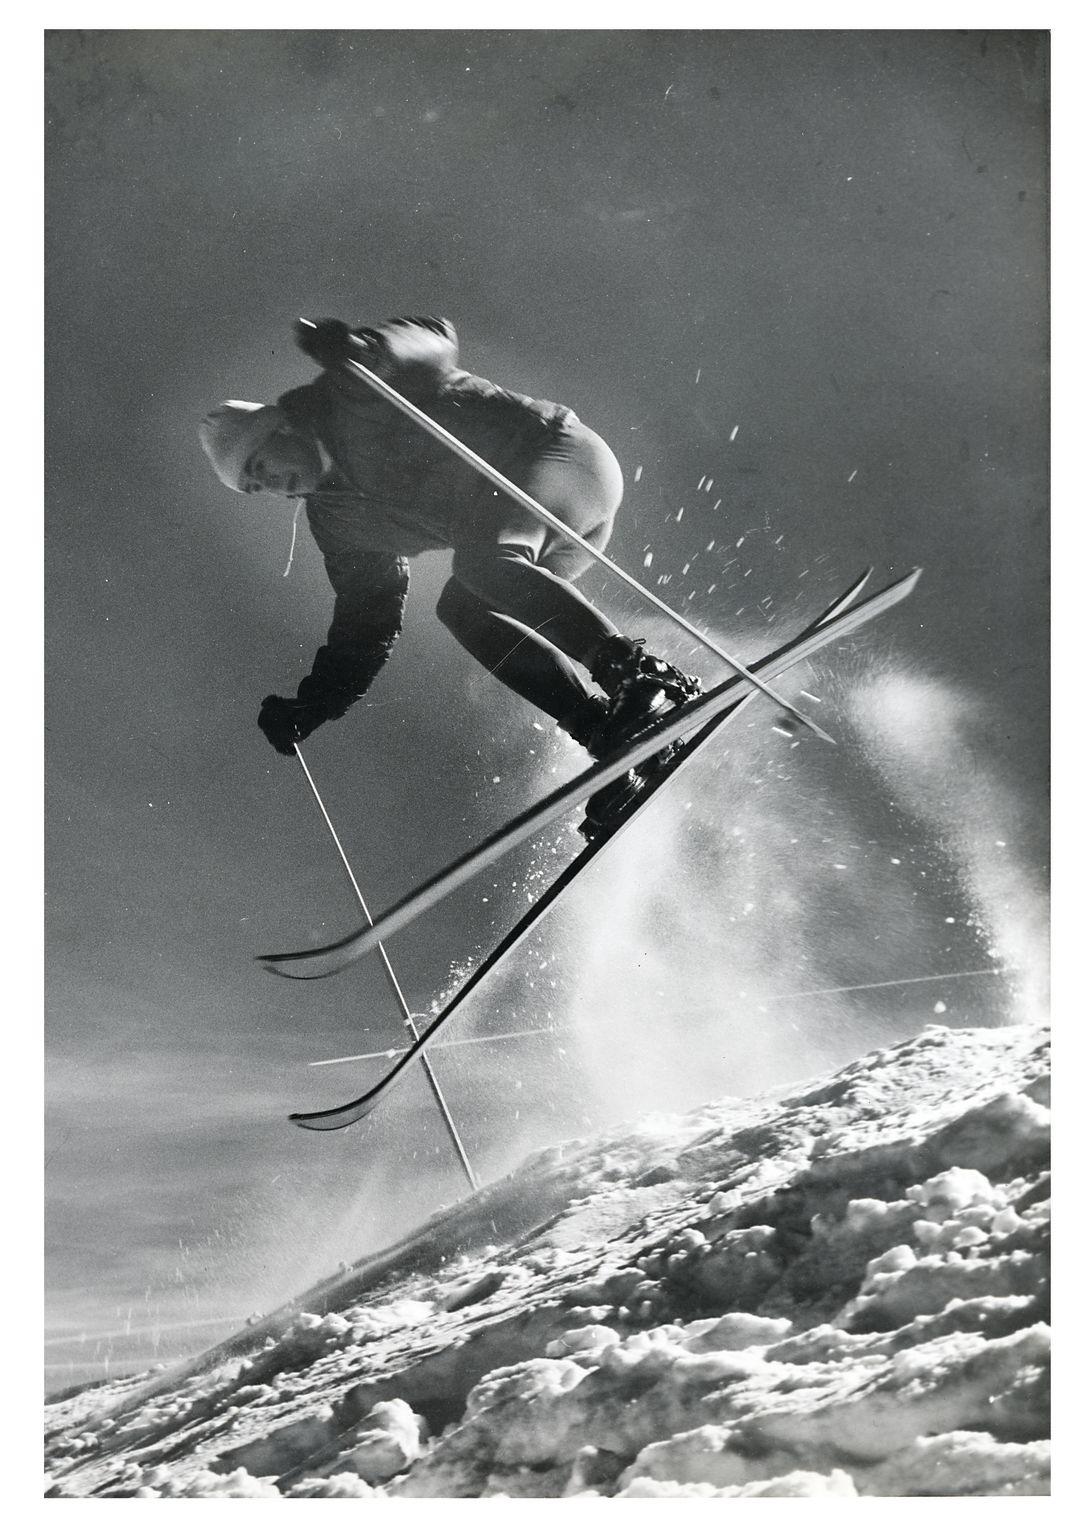 Park city winter 2013 parting shot skiier lh04wx